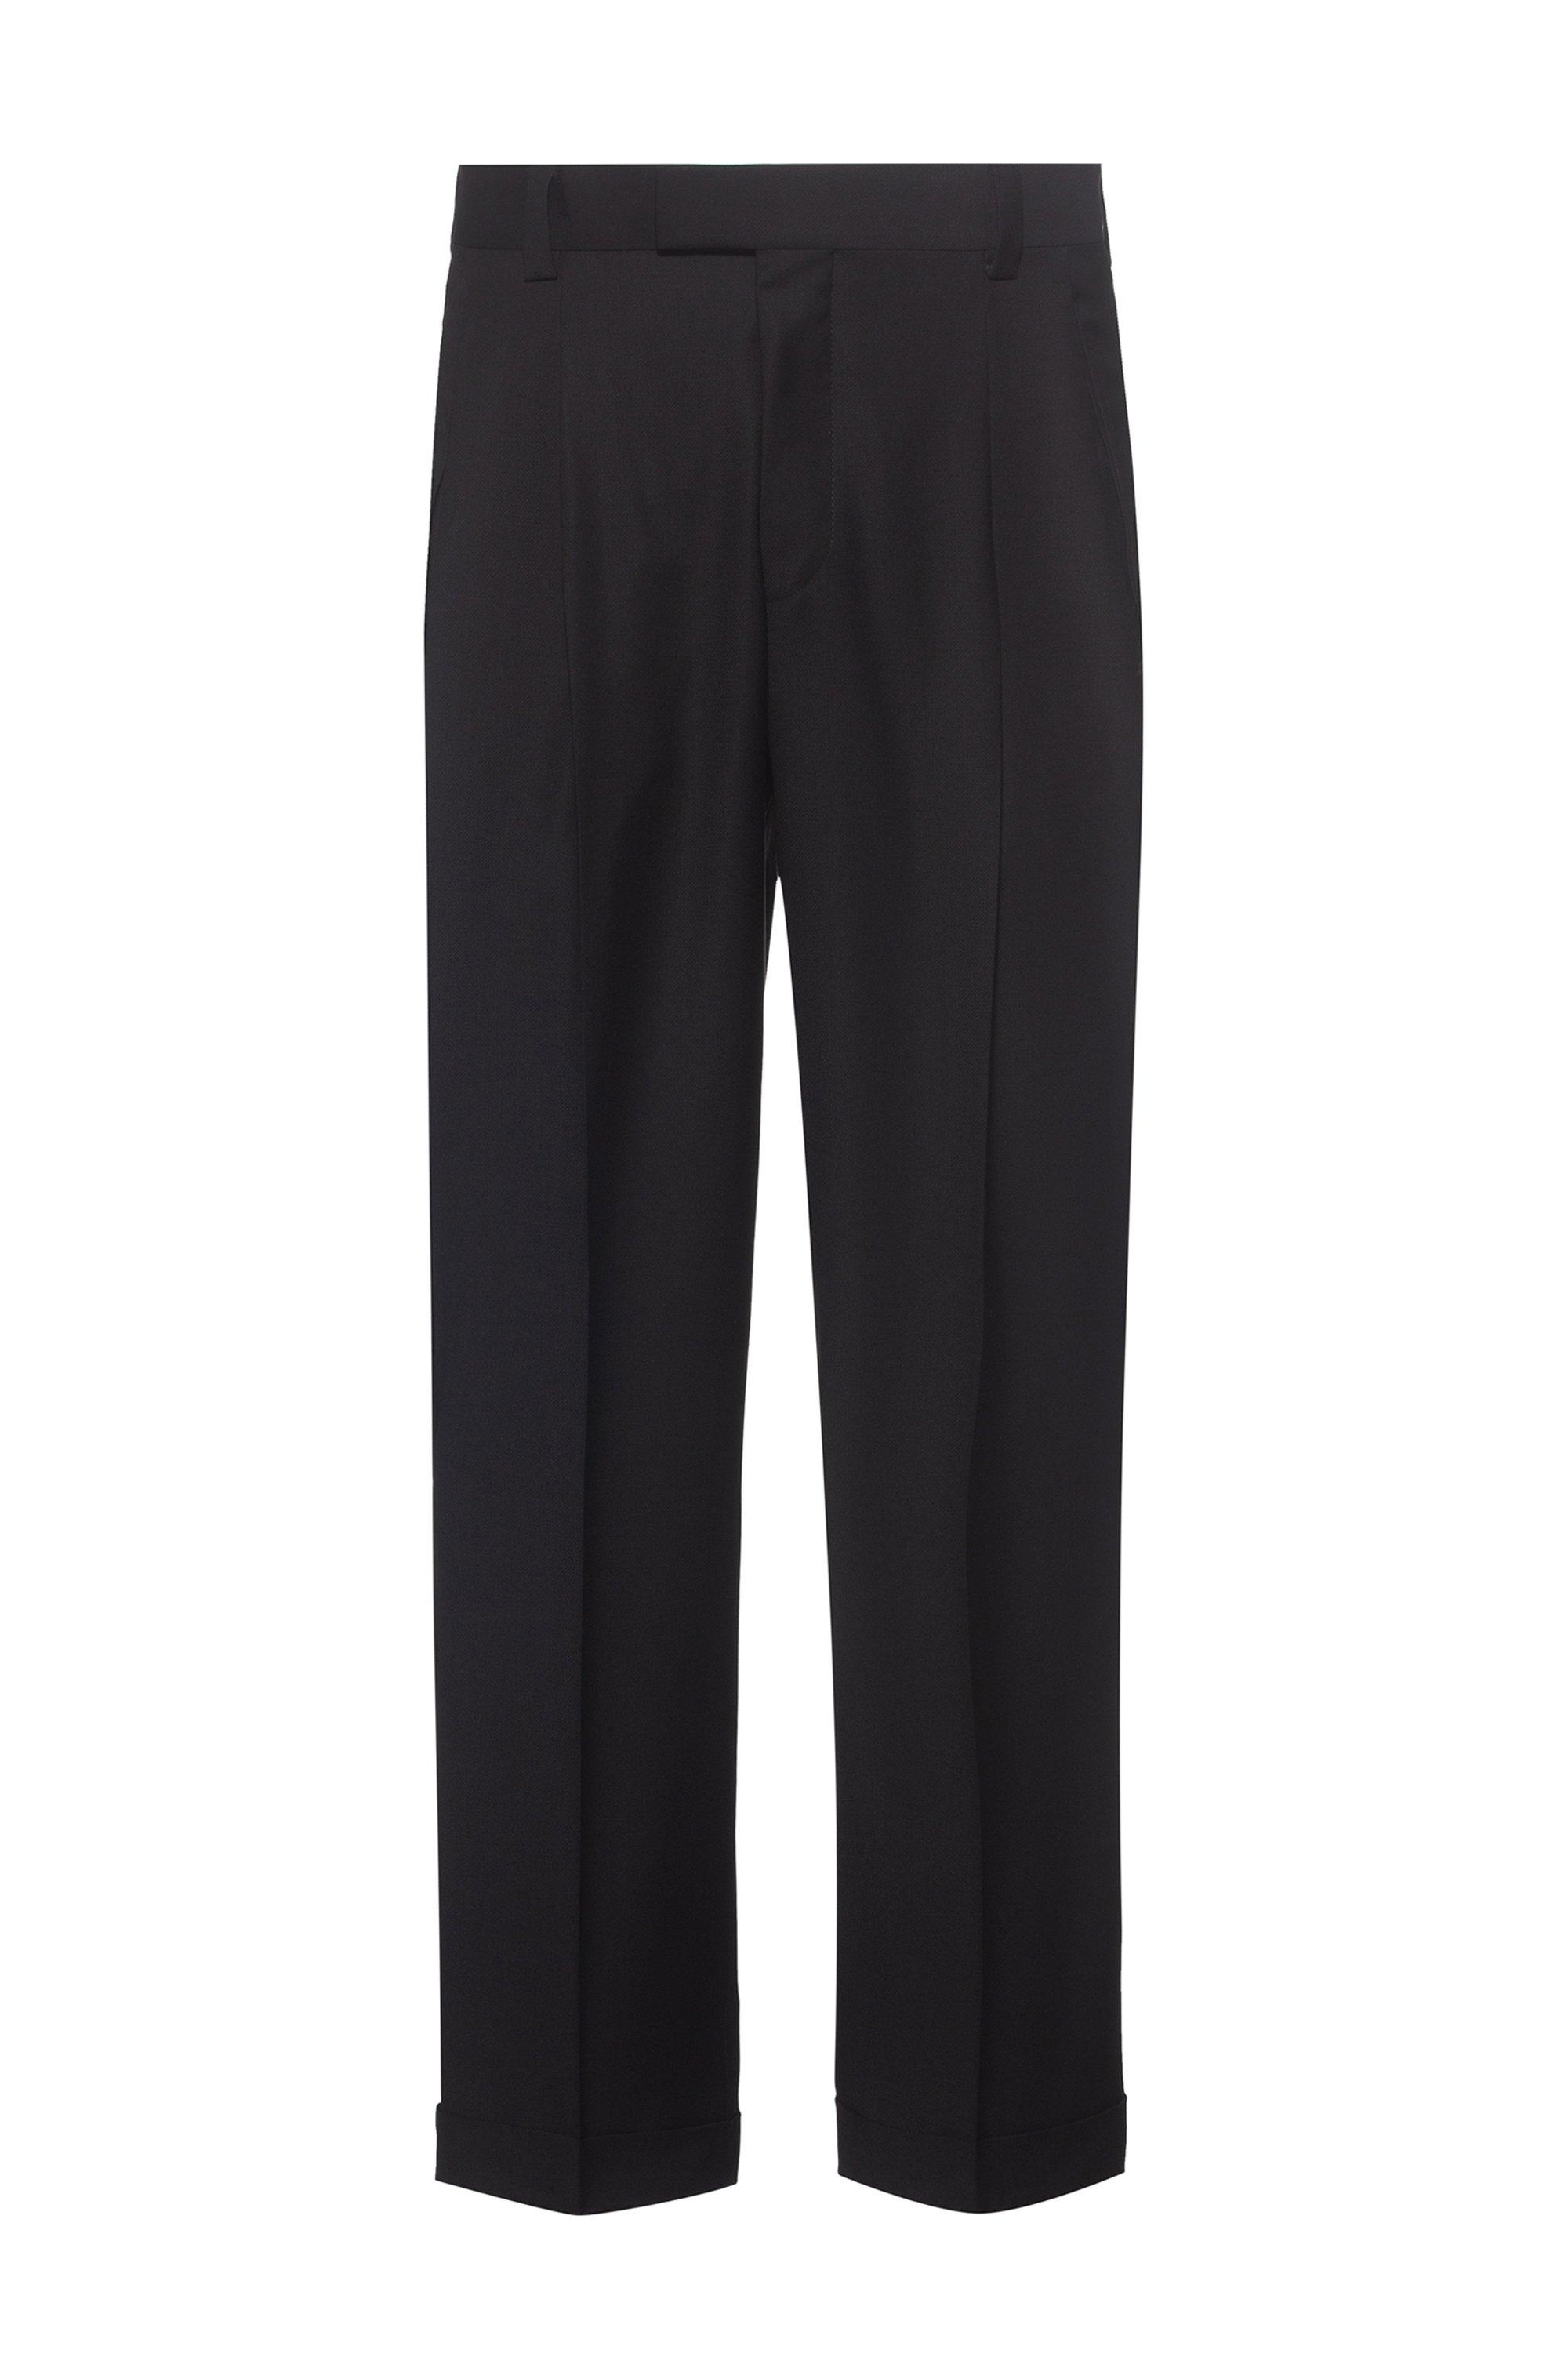 Cuffed slim-fit trousers in virgin-wool panama, Black